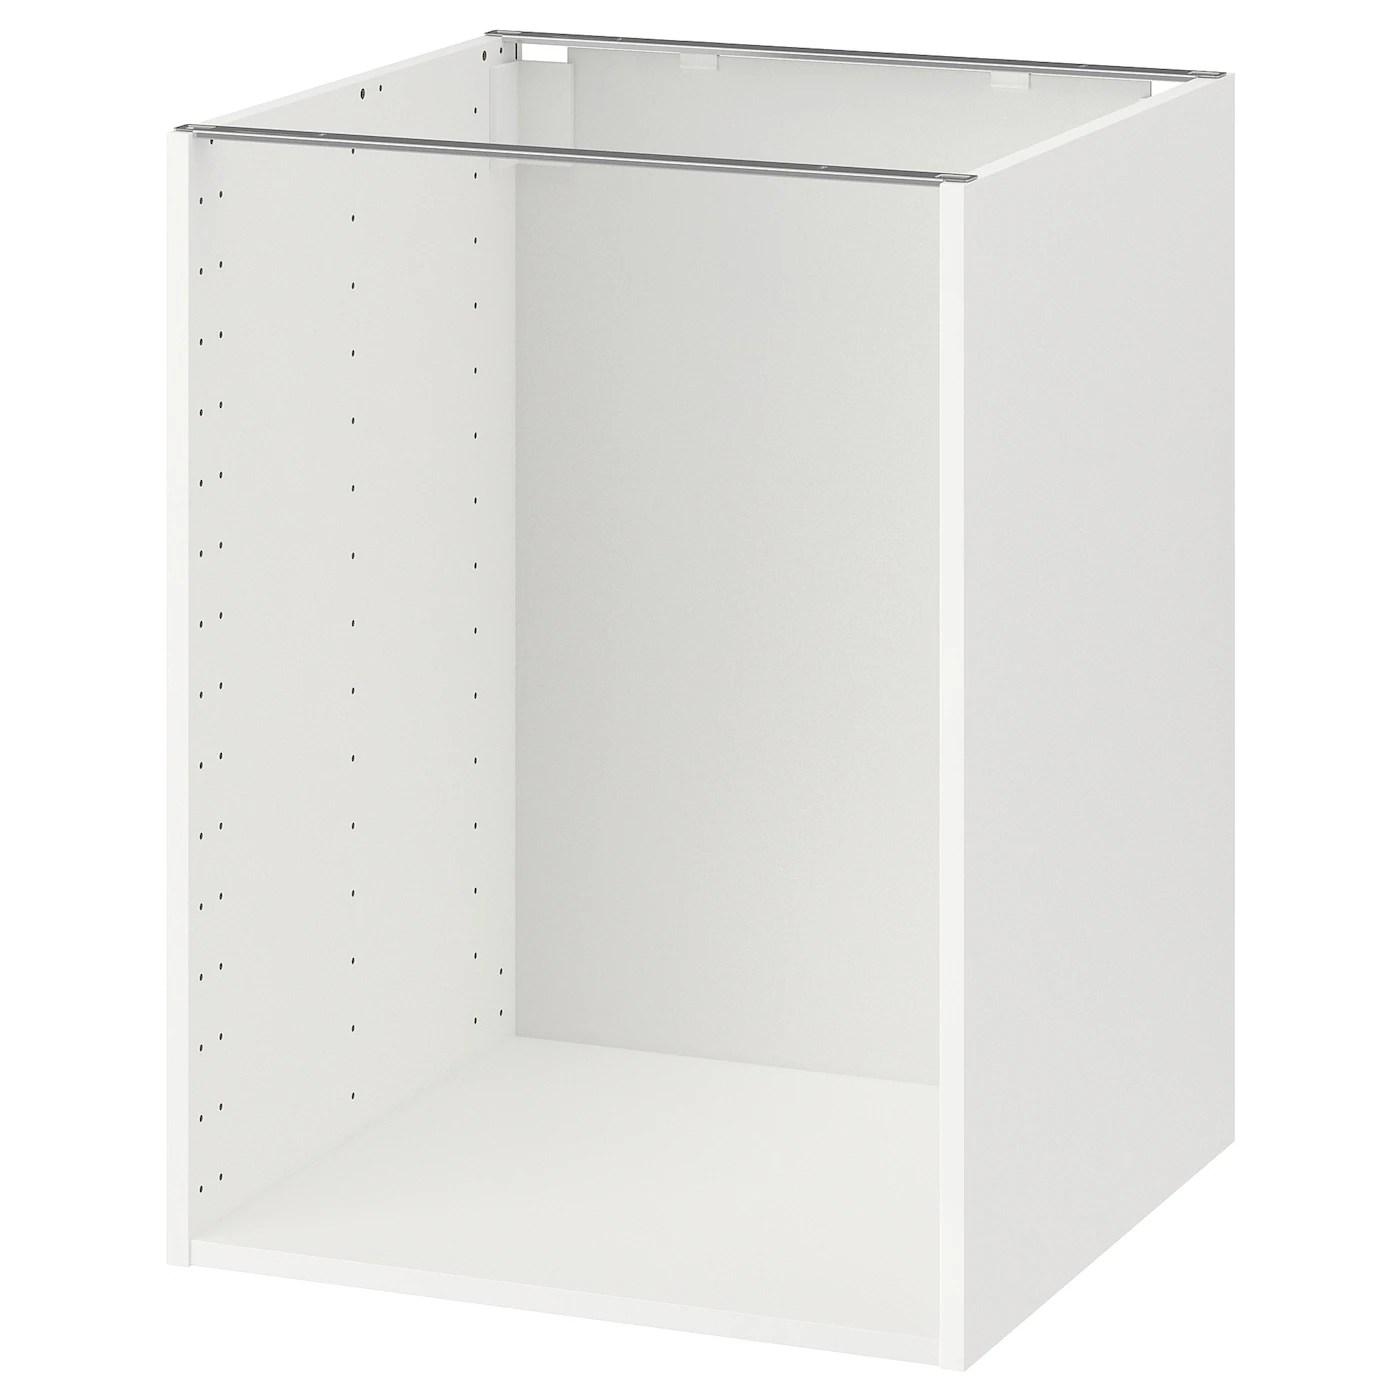 metod structure element bas blanc 60x60x80 cm